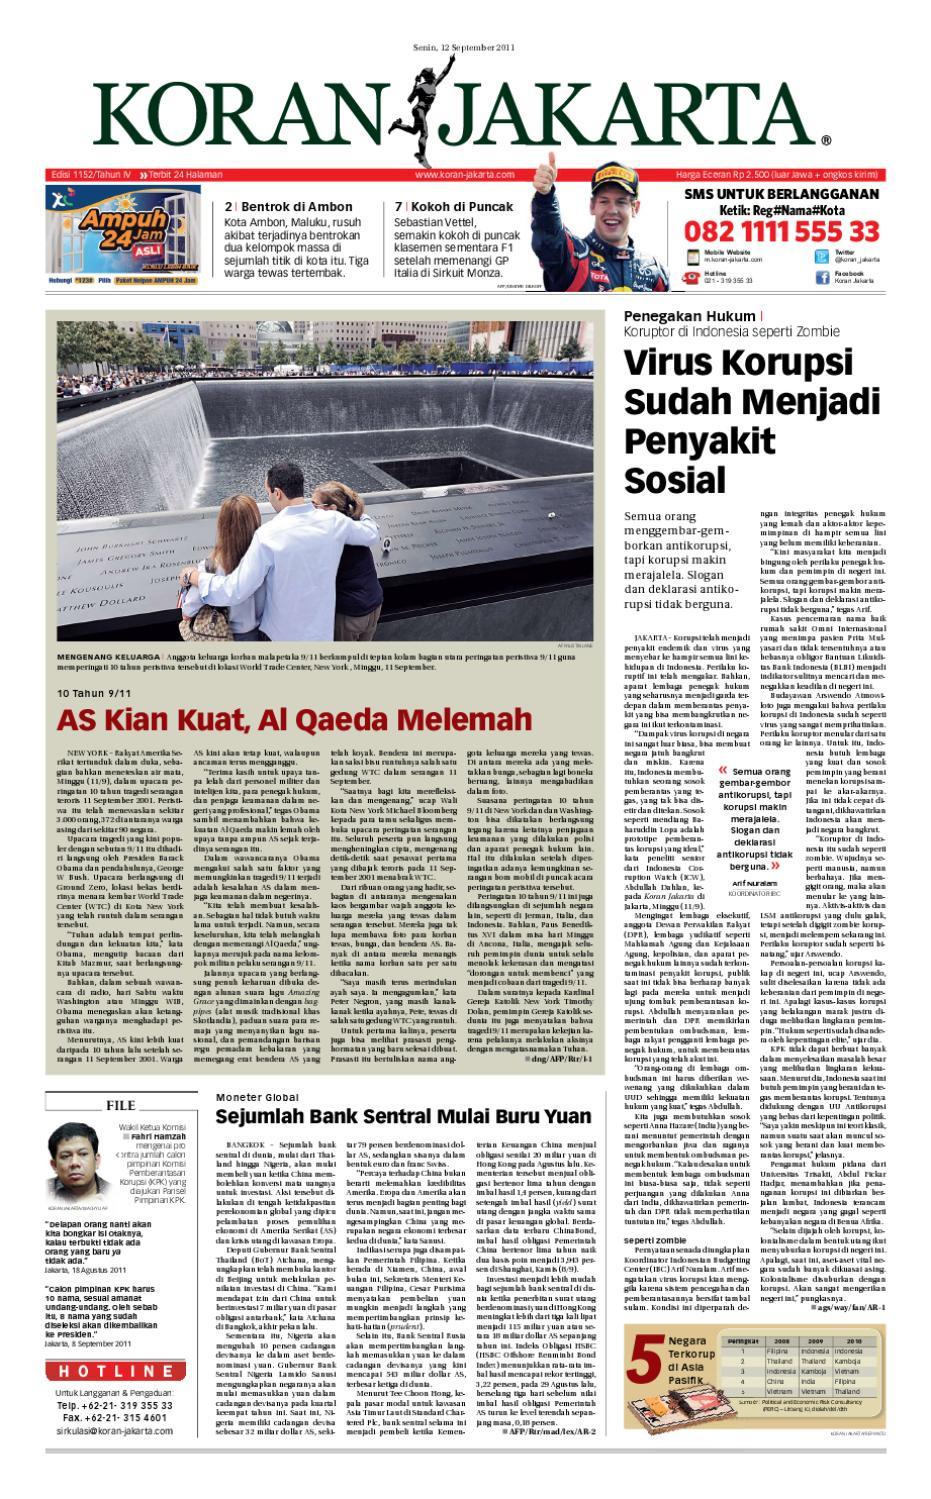 EDISI 1152 - 12 SEPTEMBER 2011.pdf by PT. Berita Nusantara - issuu 152d8338b3